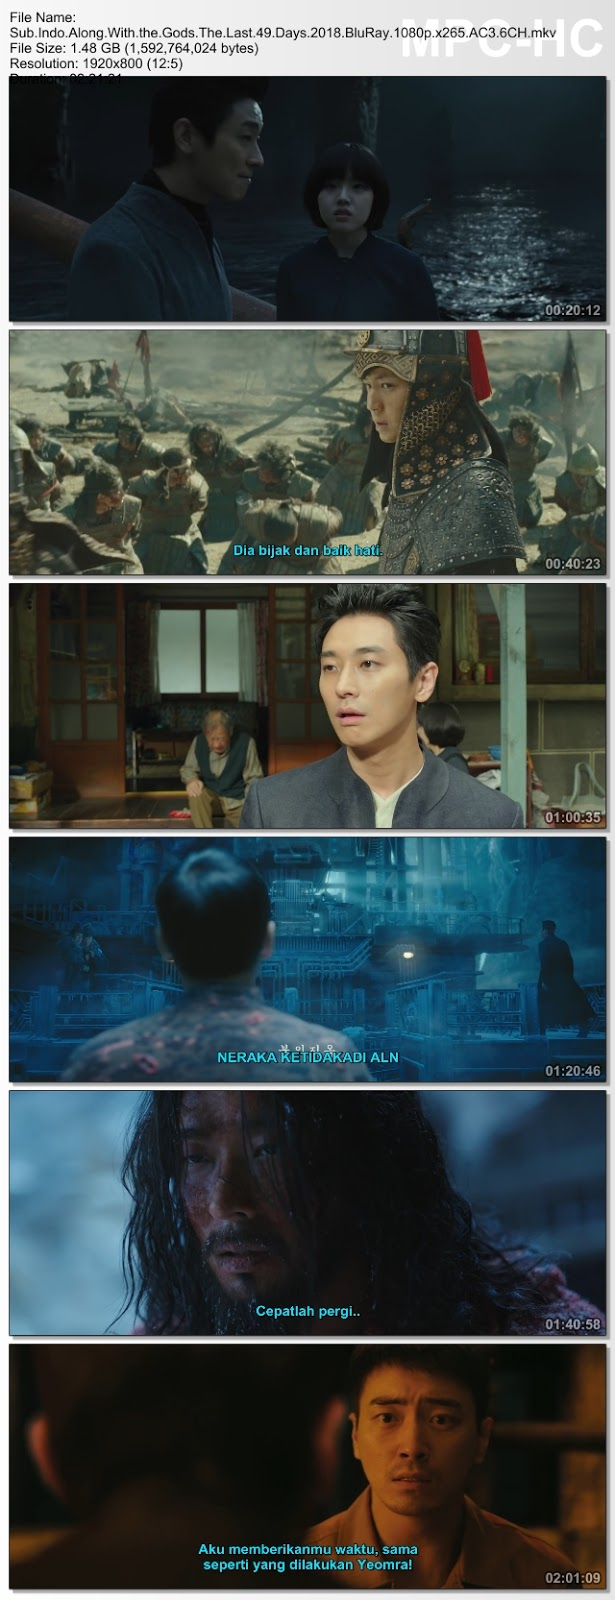 Screenshots Download Singwa hamkke: Ingwa yeon (2018) BluRay 480p & 3GP Subtitle Indonesia